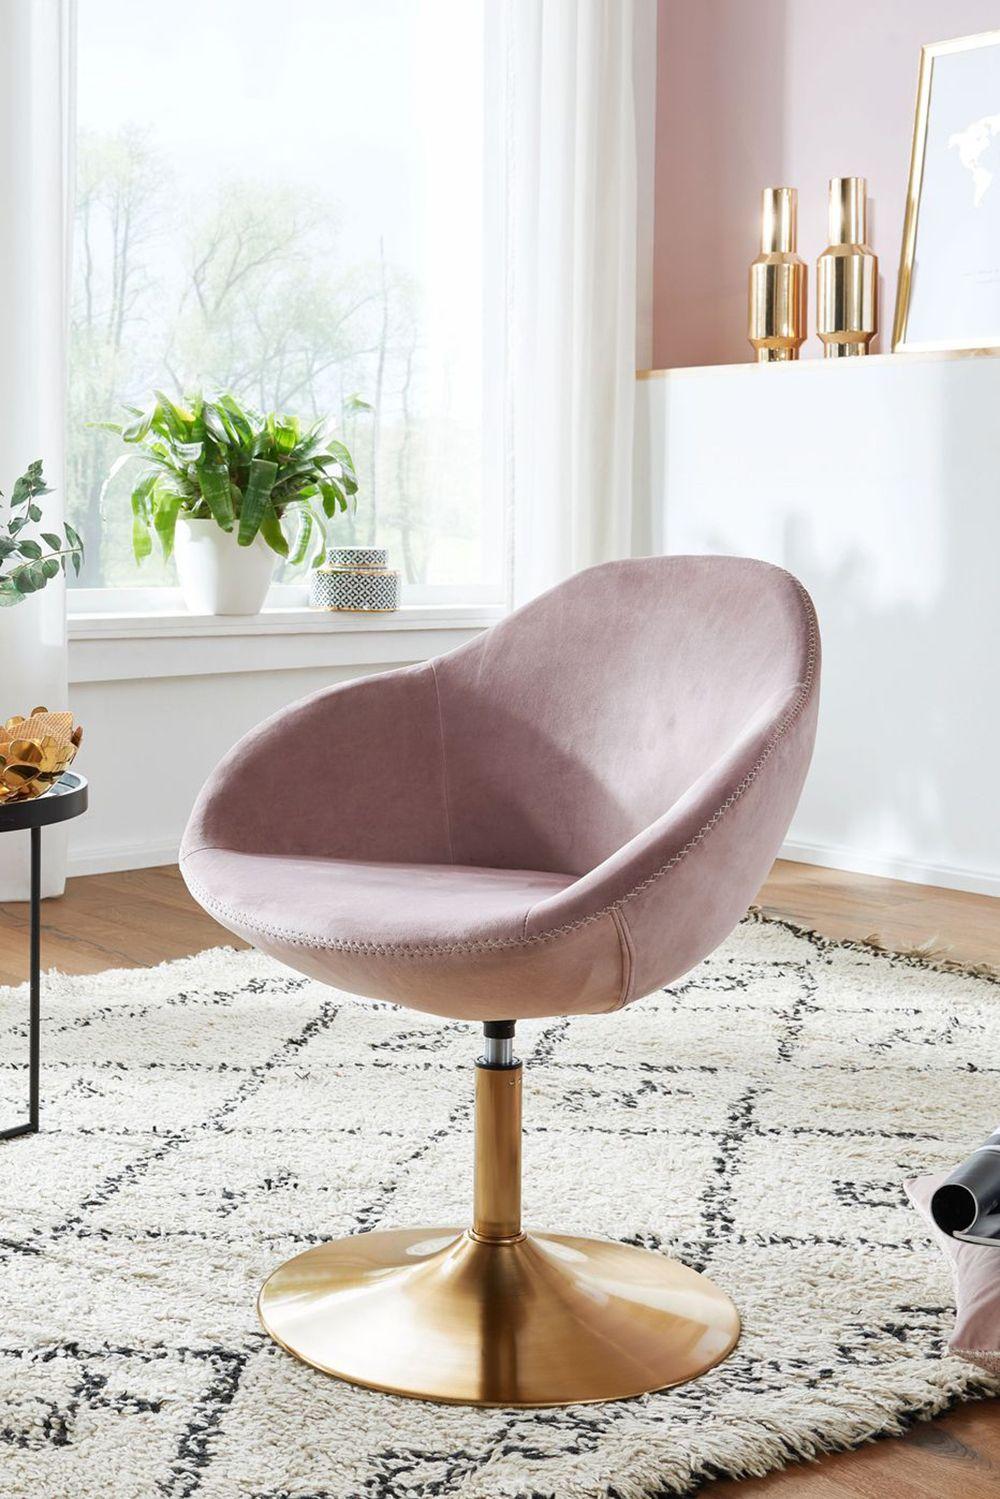 WOHNLING Loungesessel SARIN Samt Rosa / Gold 3x3x3 cm Design